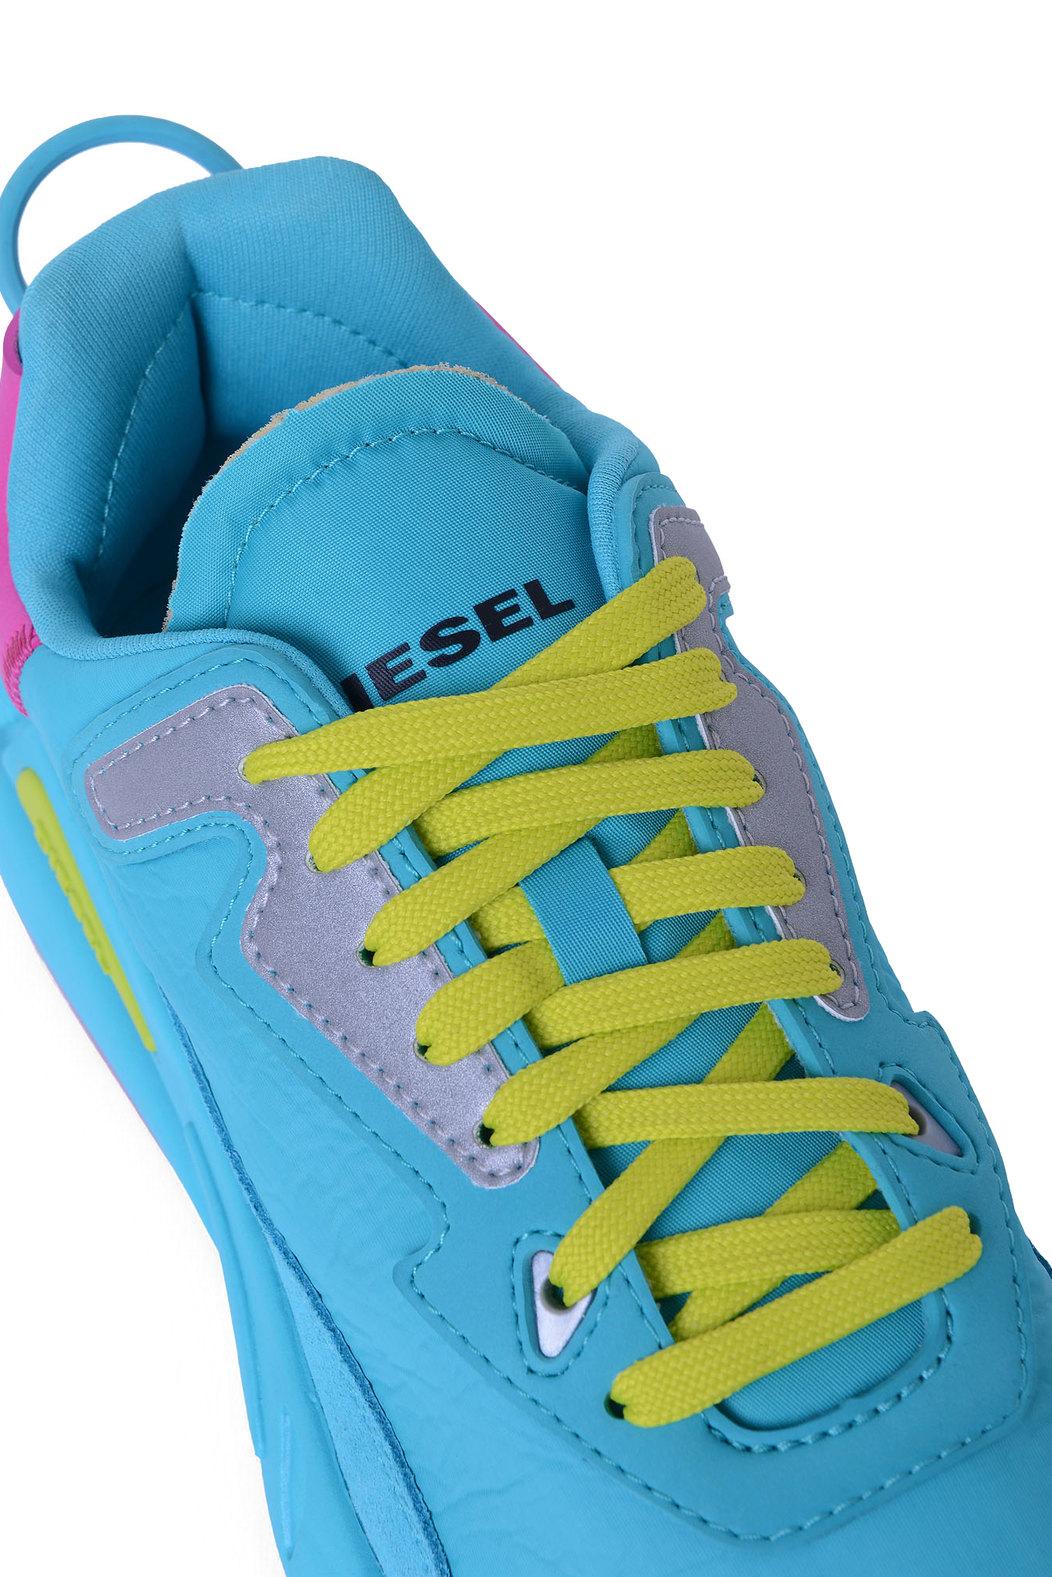 Sneakers in ruffled nylon